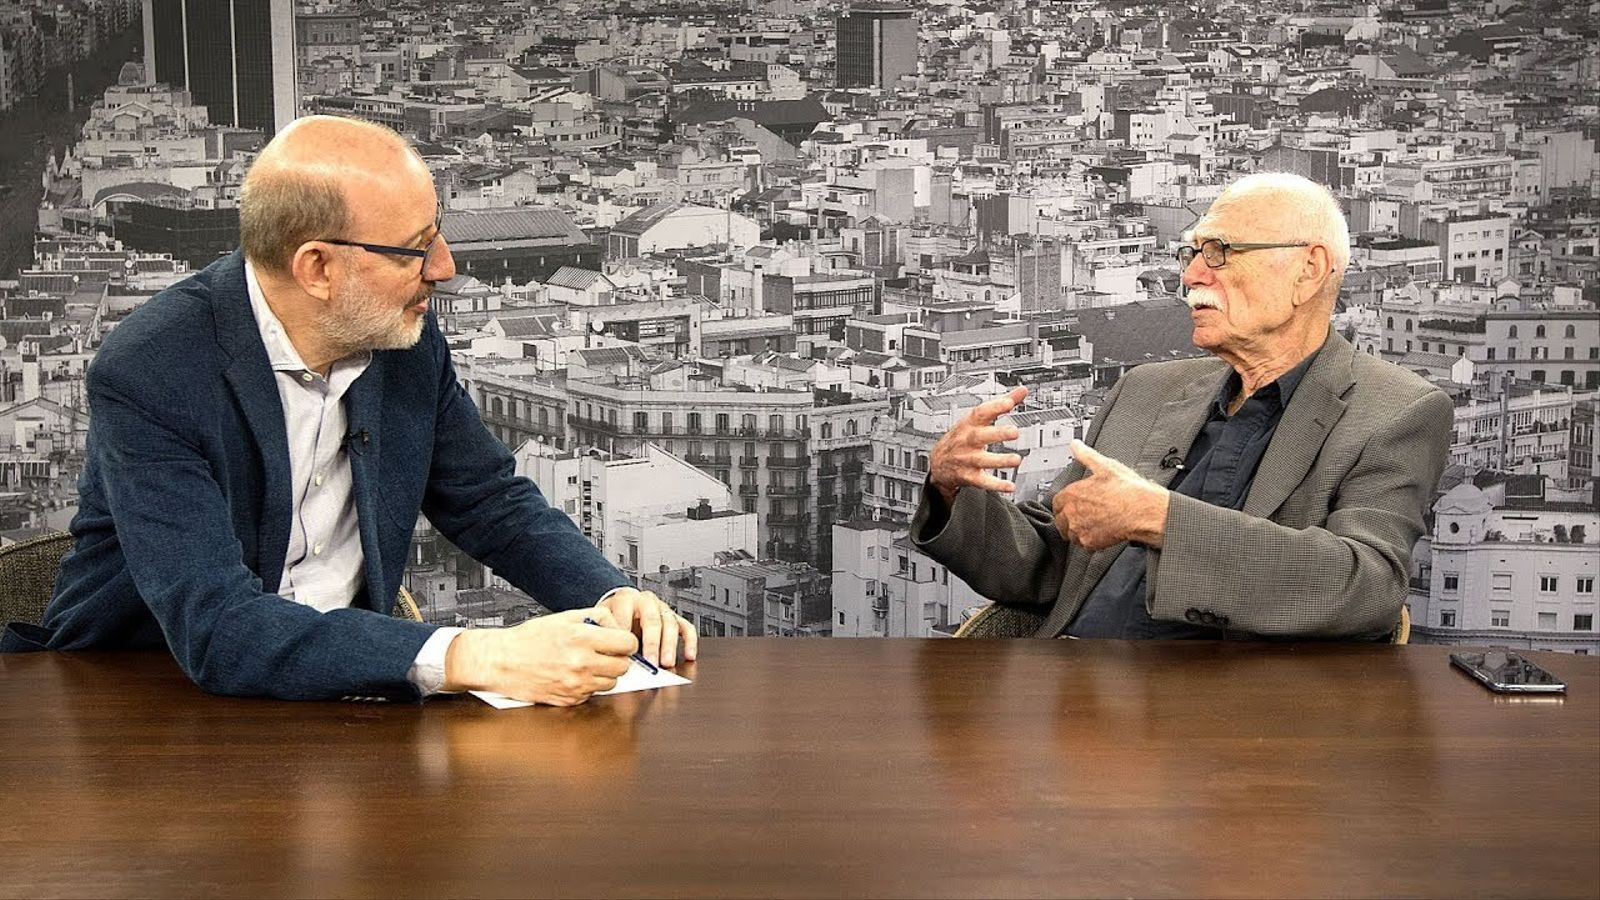 Entrevista d'Antoni Bassas a Itamar Even-Zohar